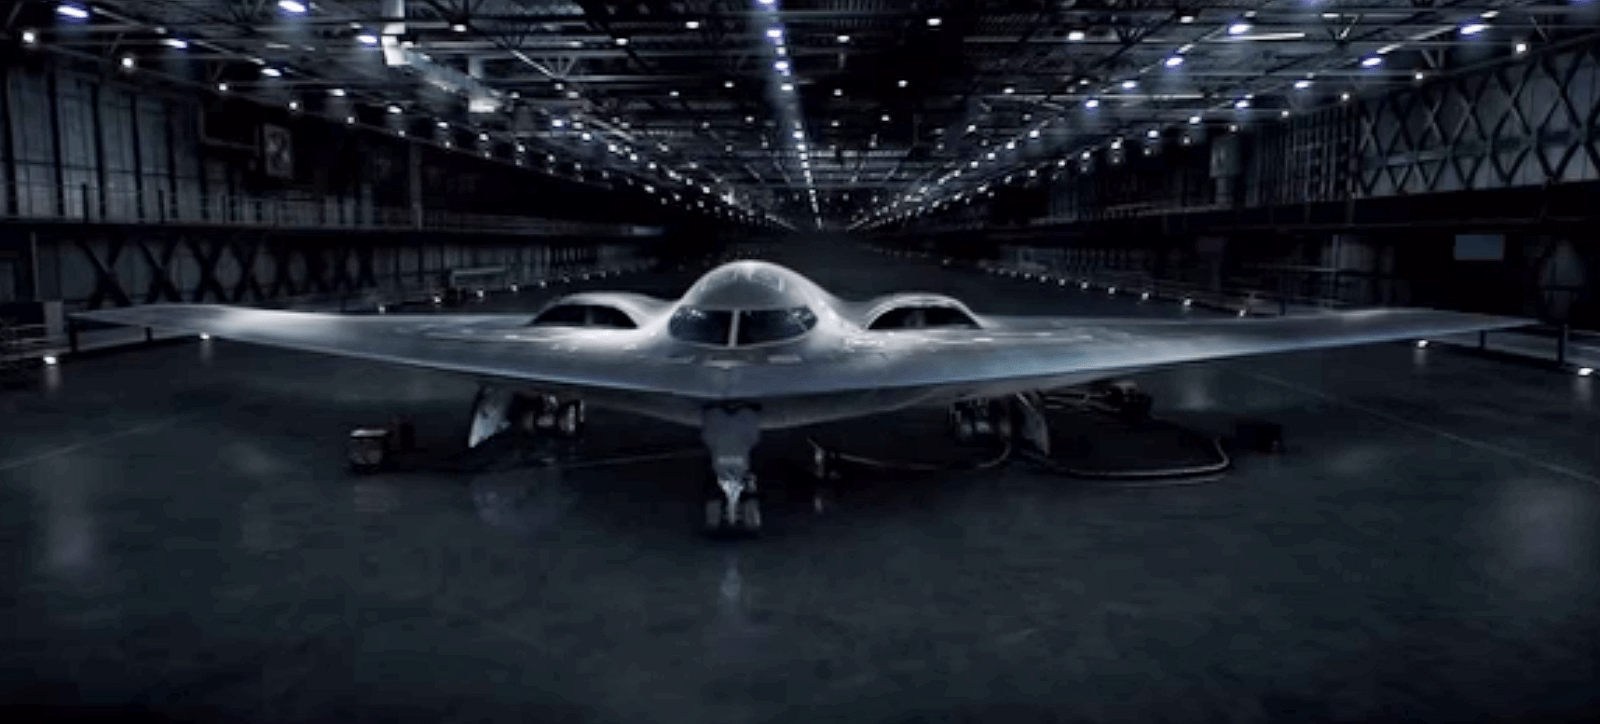 Northrop Grumman B-21 Raider Stealth Bomber to Replace B-2s, B-1s